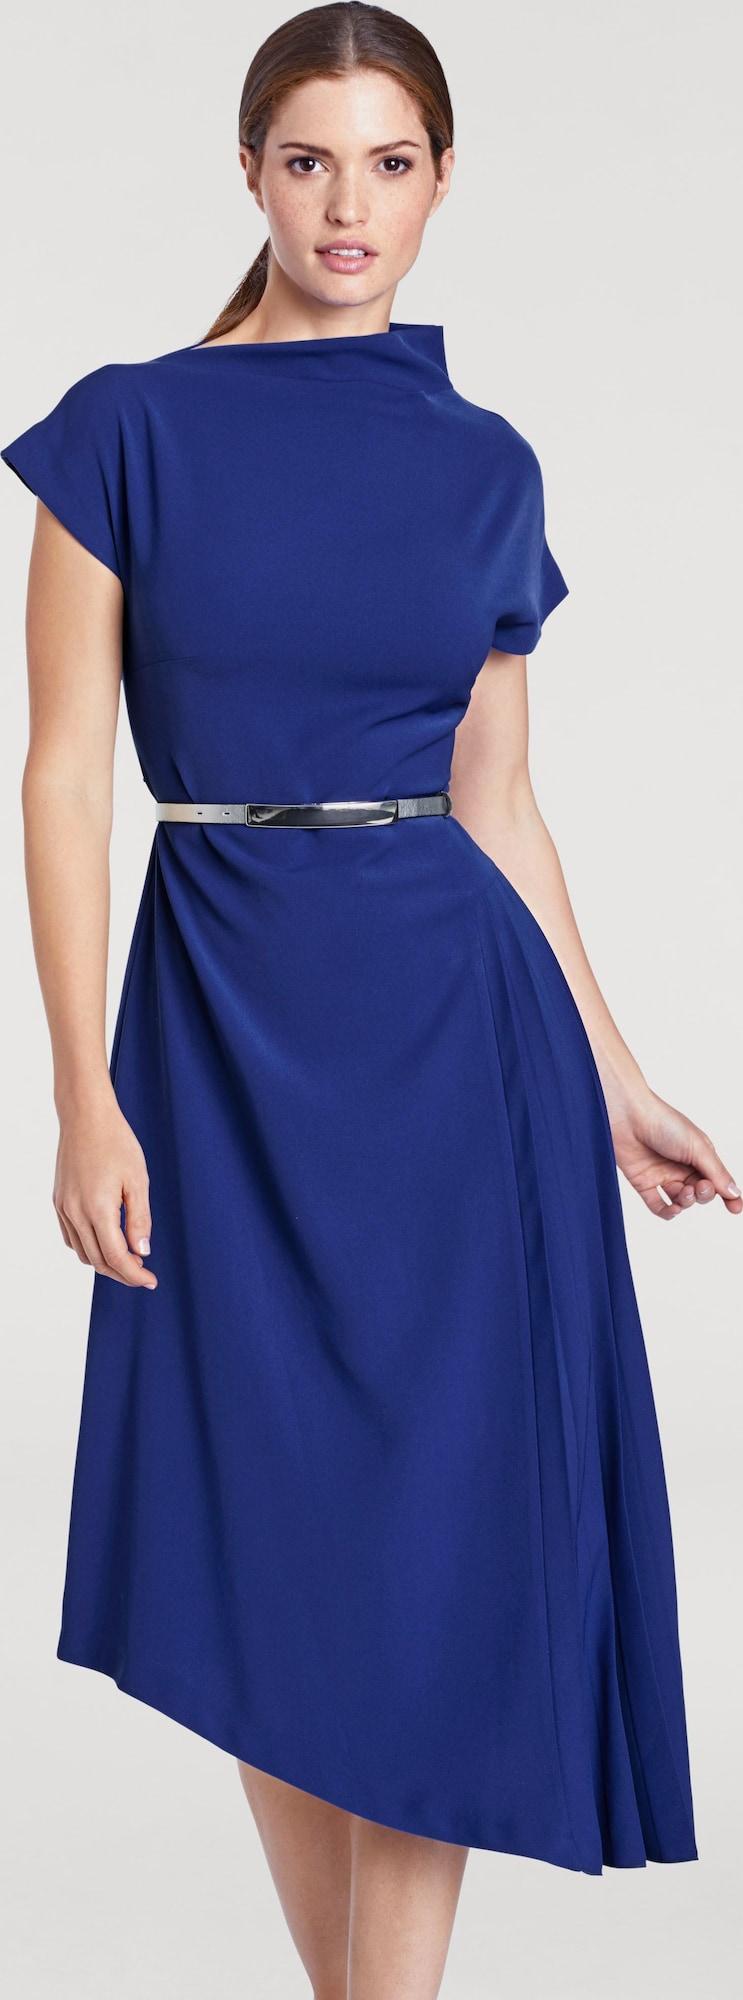 ashley brooke by heine kleid mit bindeg rtel in blau about you. Black Bedroom Furniture Sets. Home Design Ideas